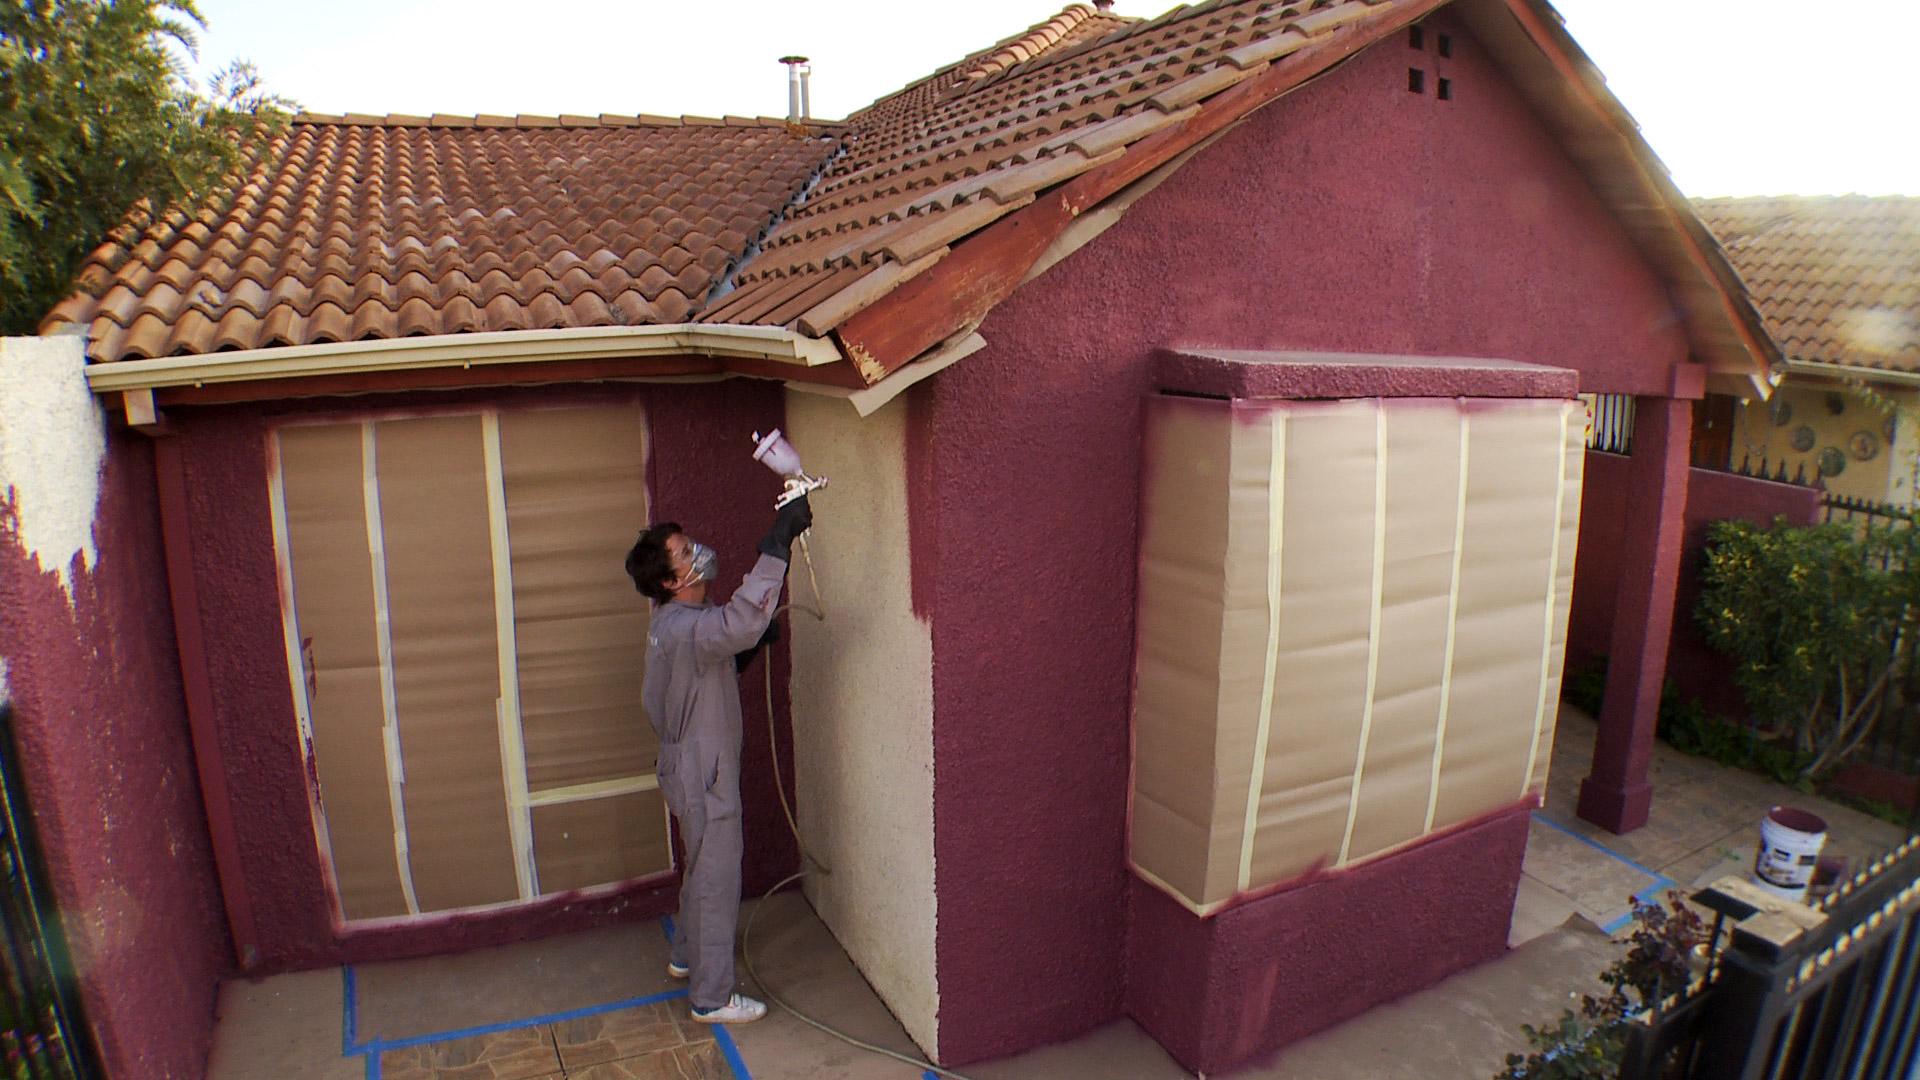 H galo usted mismo c mo elegir pintura correcta - Como puedo pintar mi casa ...